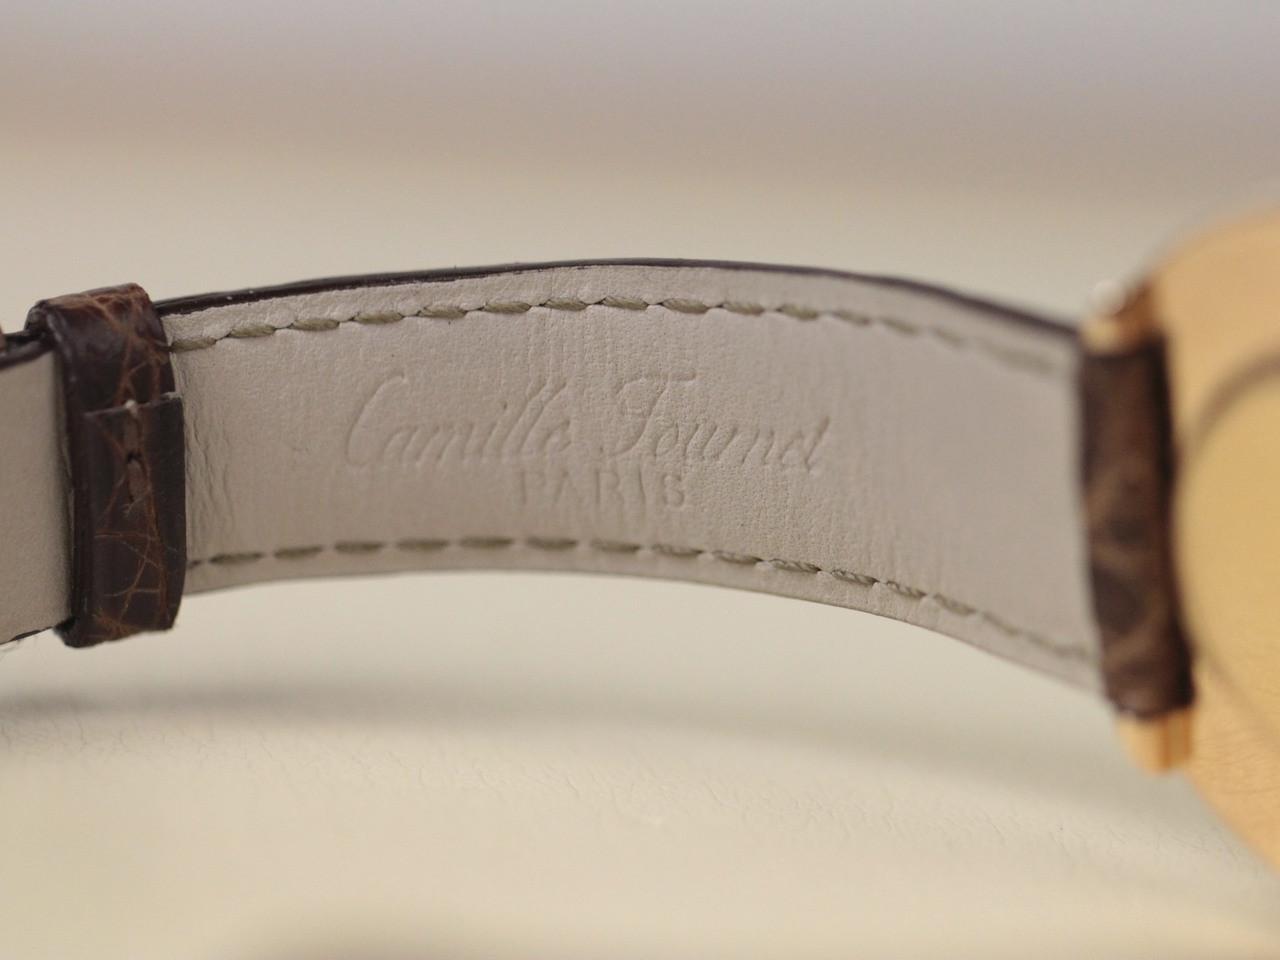 Brown Leather Strap - Vintage Vacheron Constantin Vintage Gold Watch - www.Legendoftime.com - Chicago Watch Center